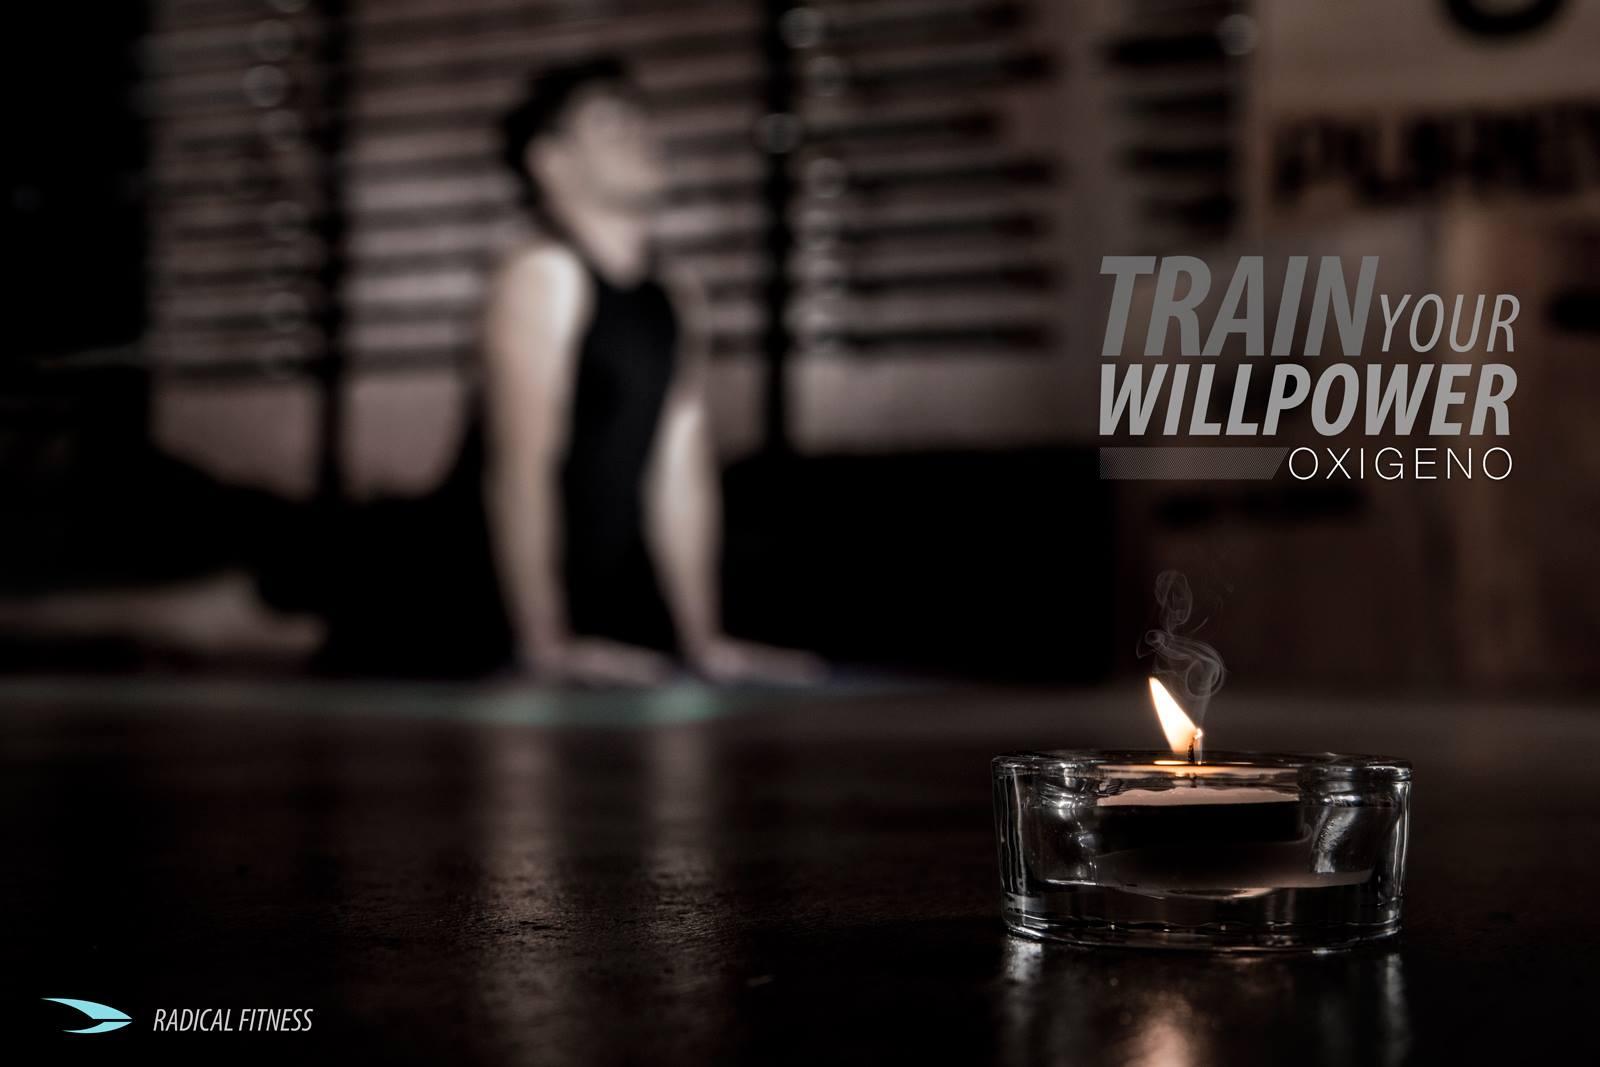 Radical Fitness - OXIGENO poster